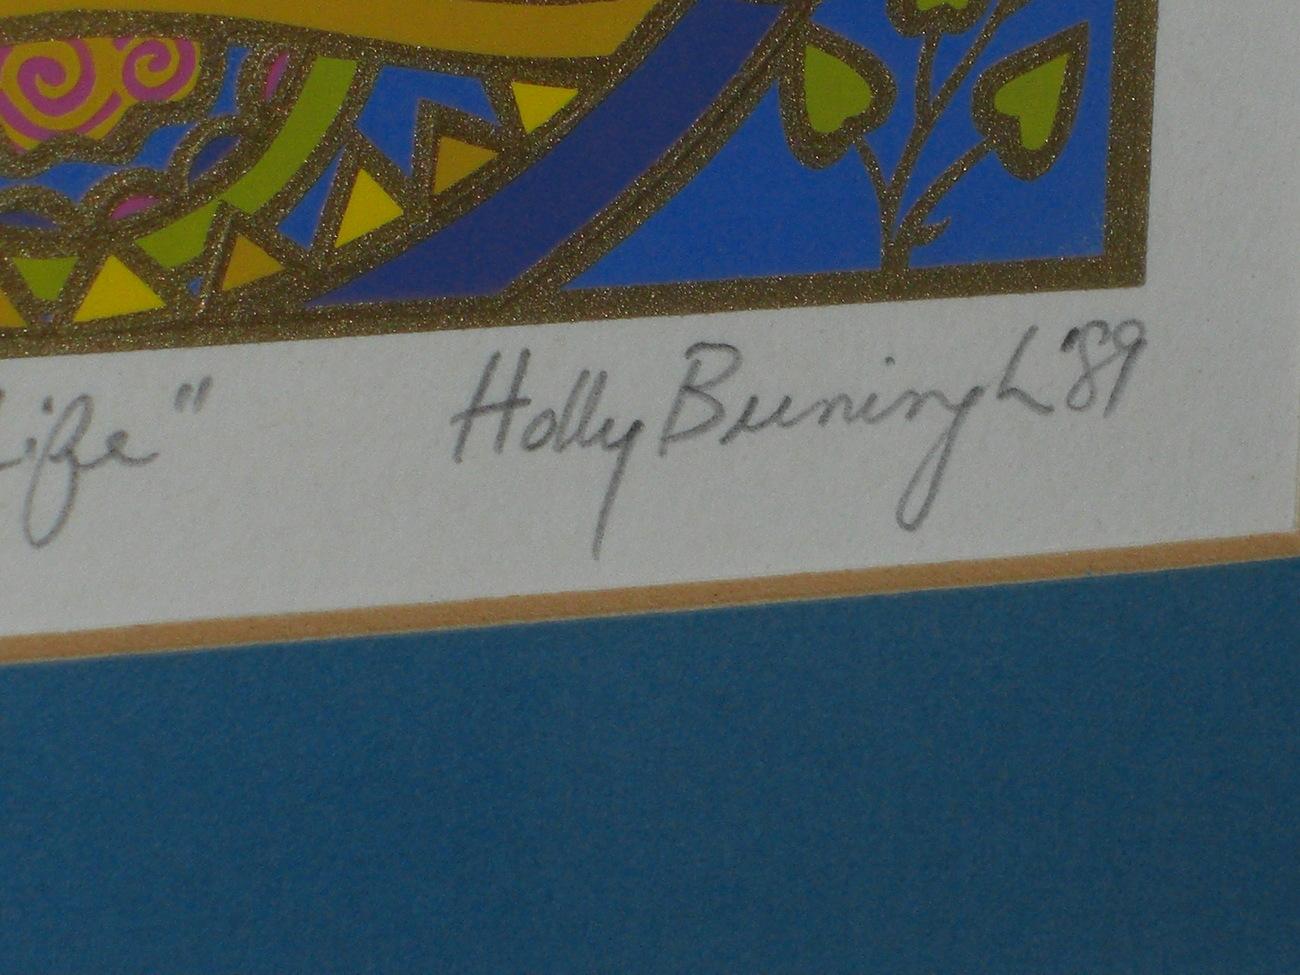 ARMADILLOS ENJOY LIFE Serigraph by Holly Buningh '89